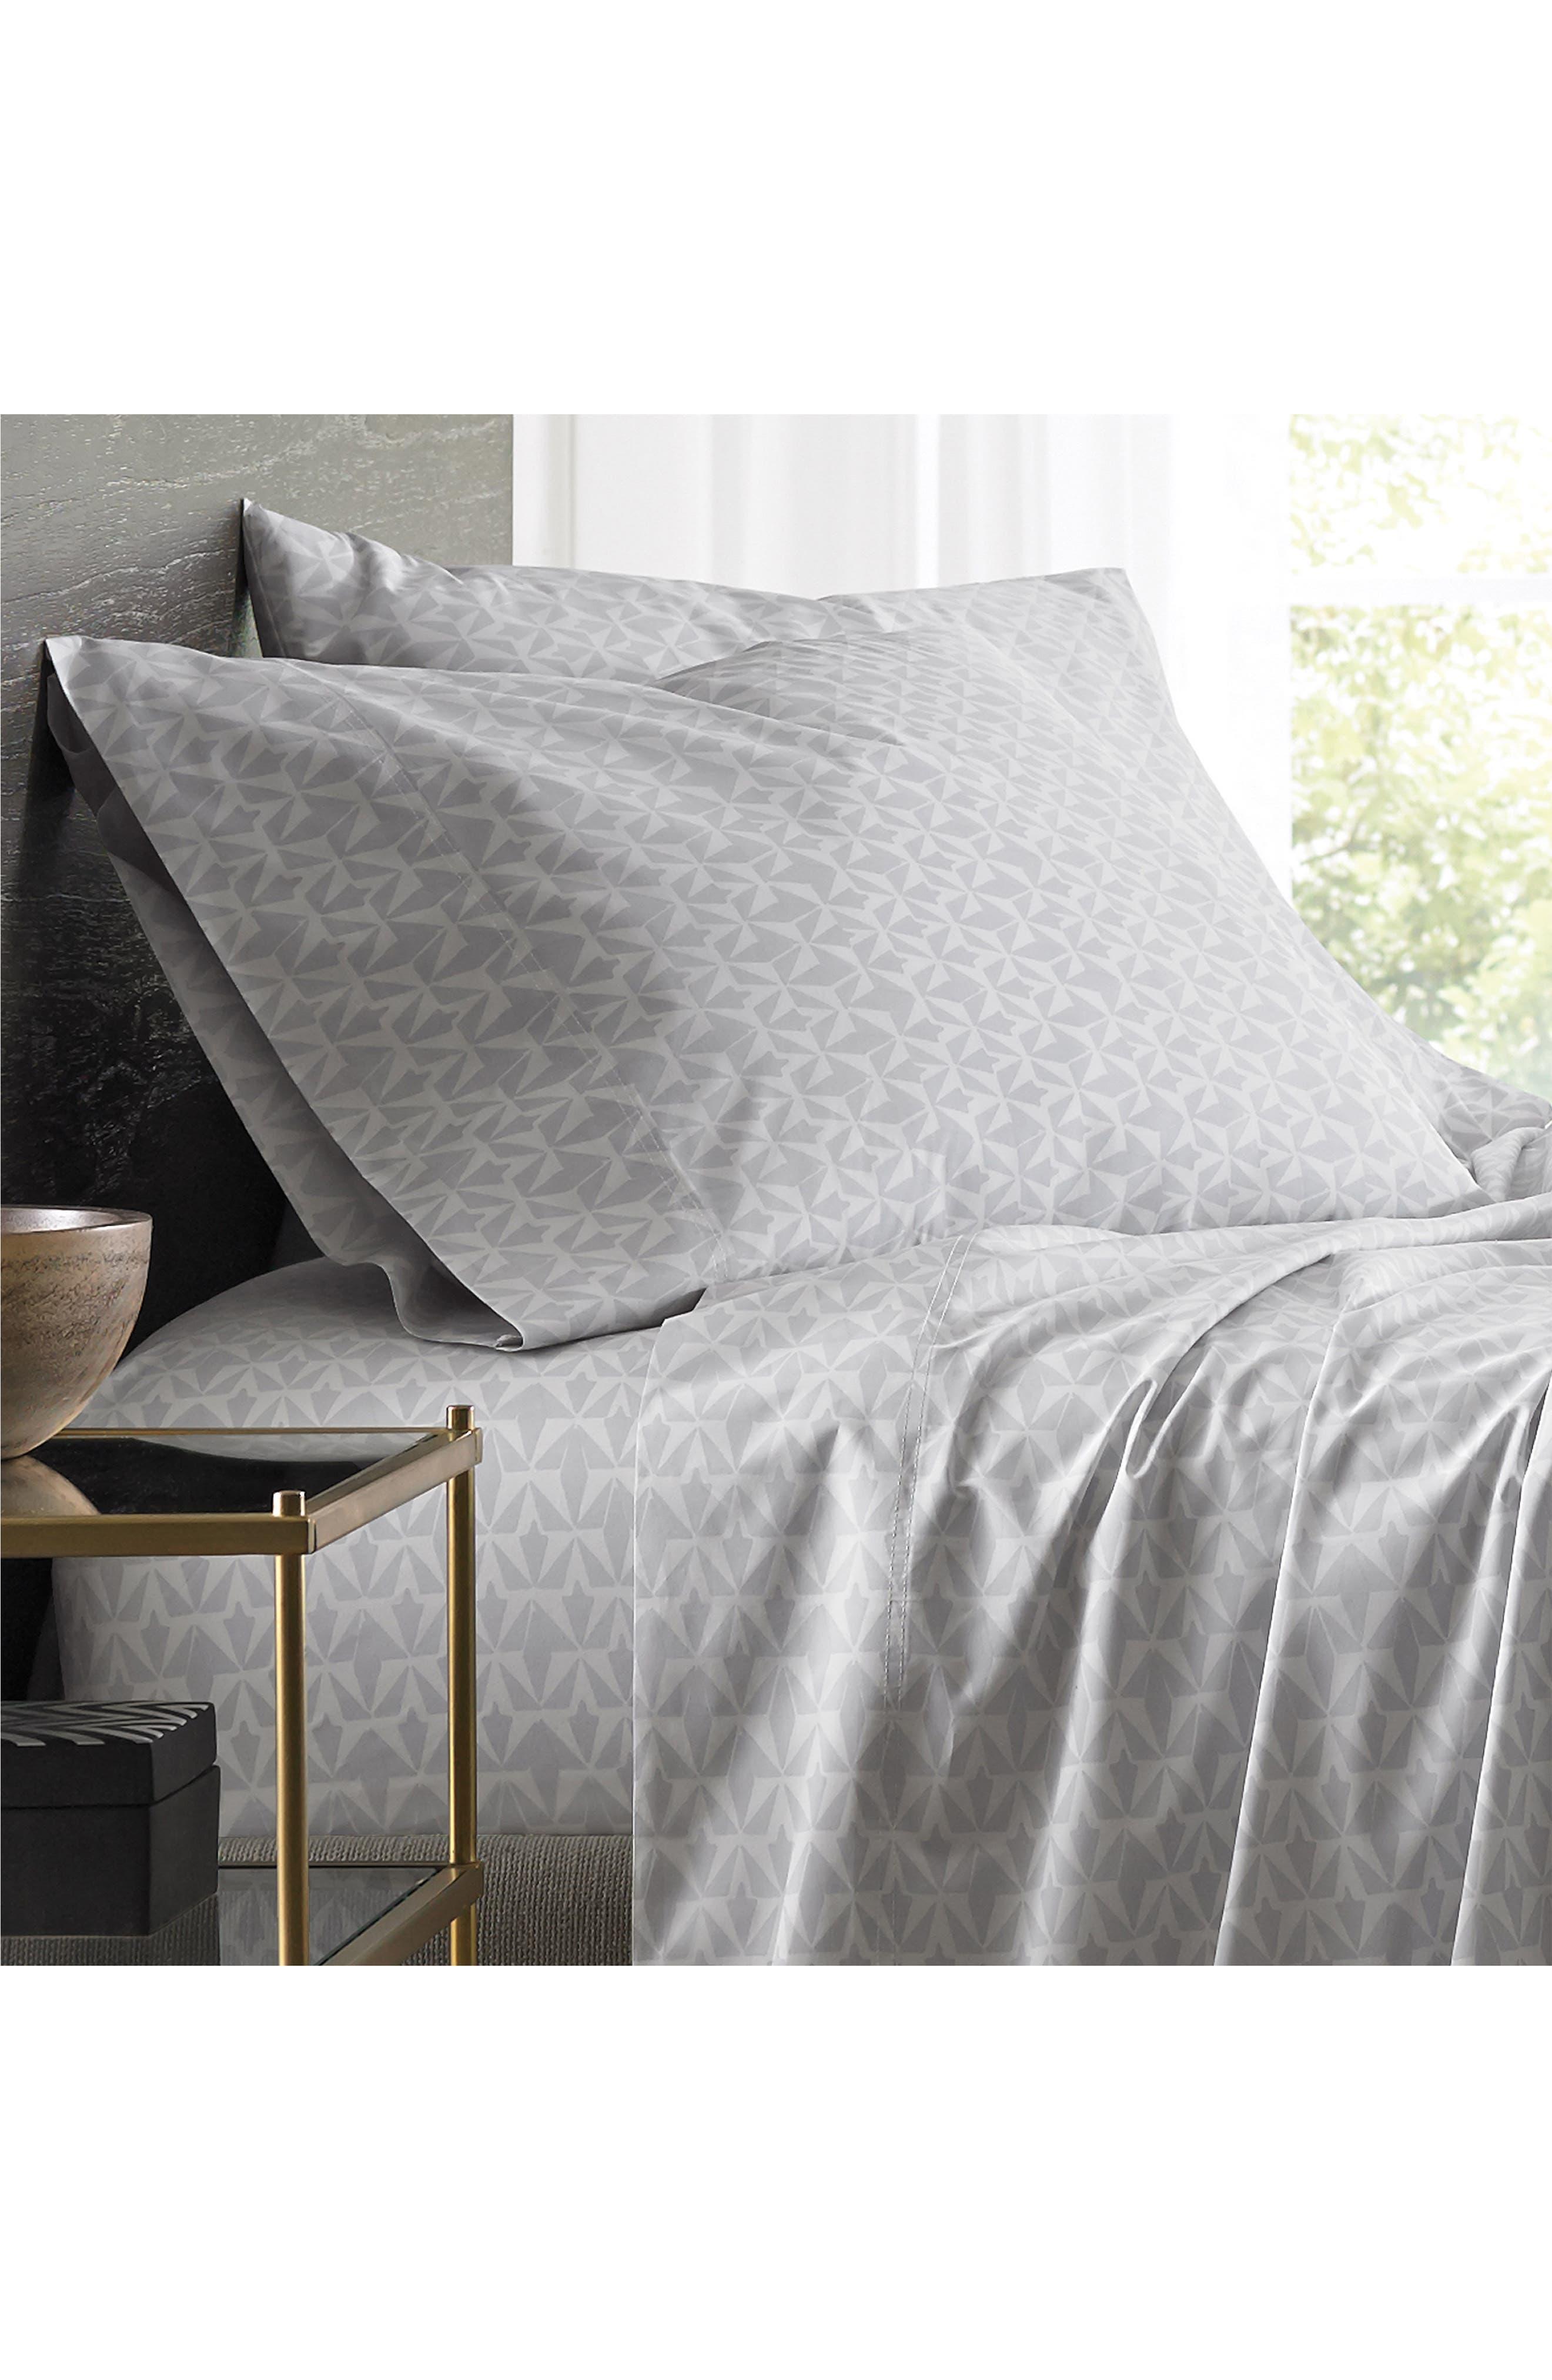 Grasslands 300 Thread Count Pair of Pillowcases,                             Alternate thumbnail 2, color,                             Nibus/ Light/ Pastel Grey